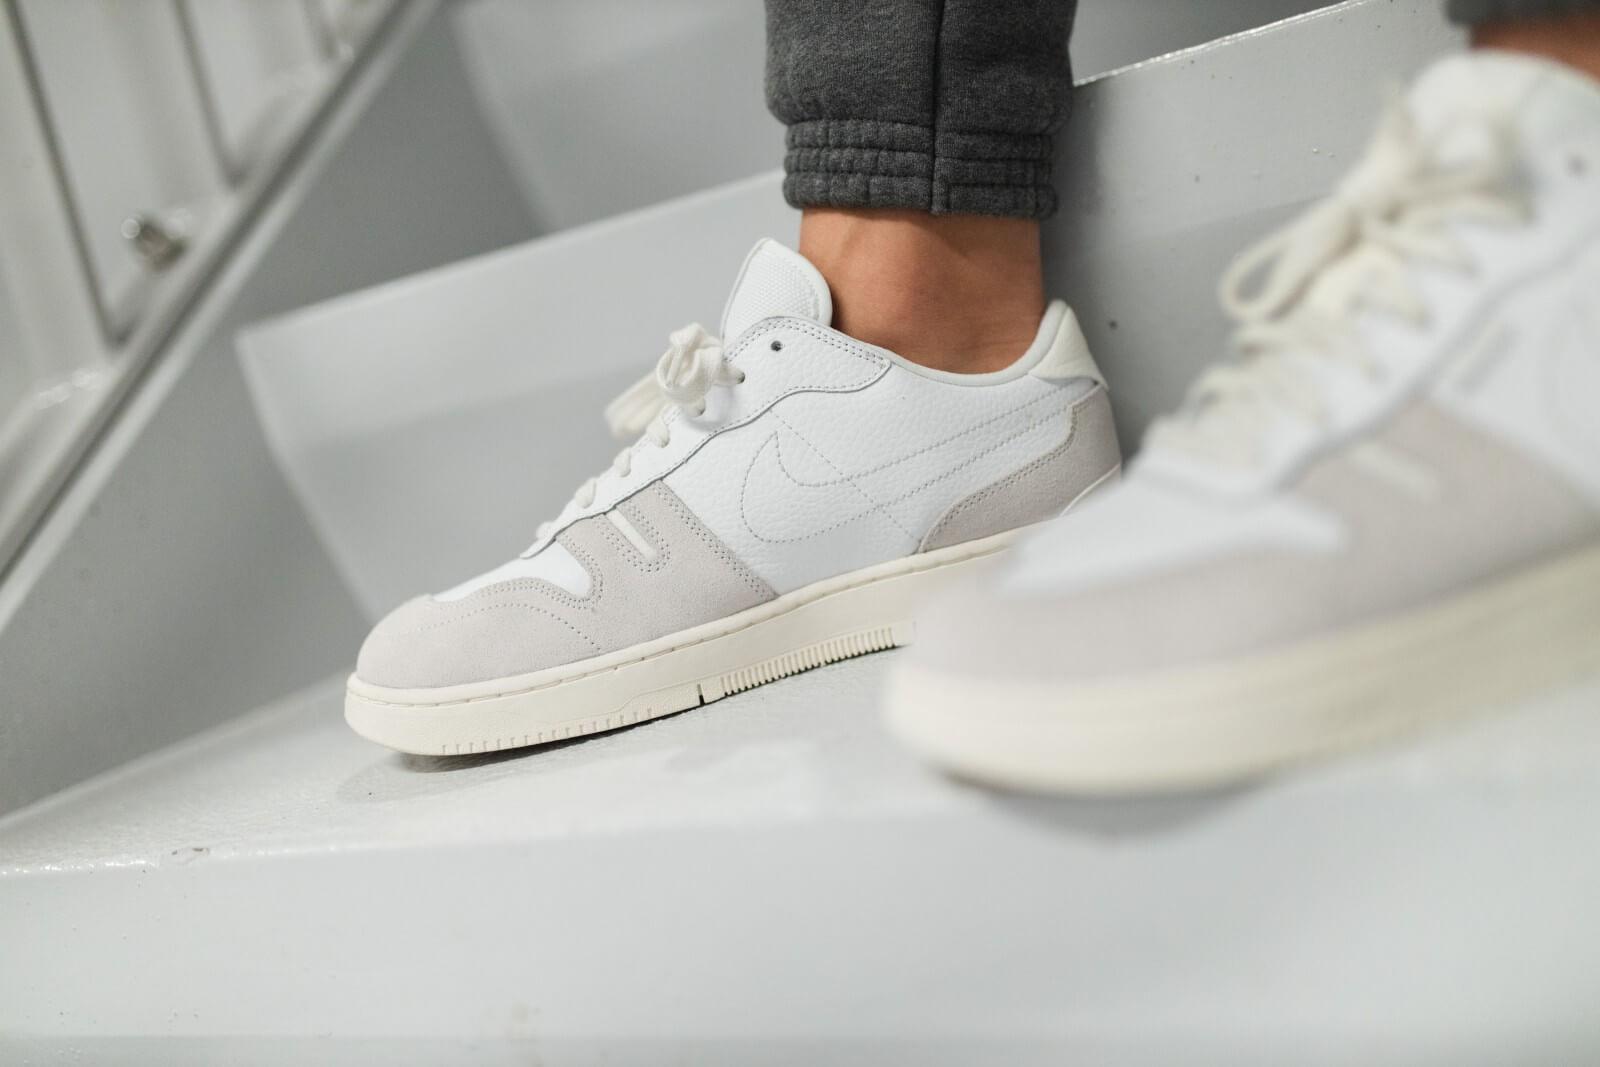 Nike Squash-Type White/Platinum Tint-Sail - CW7587-100